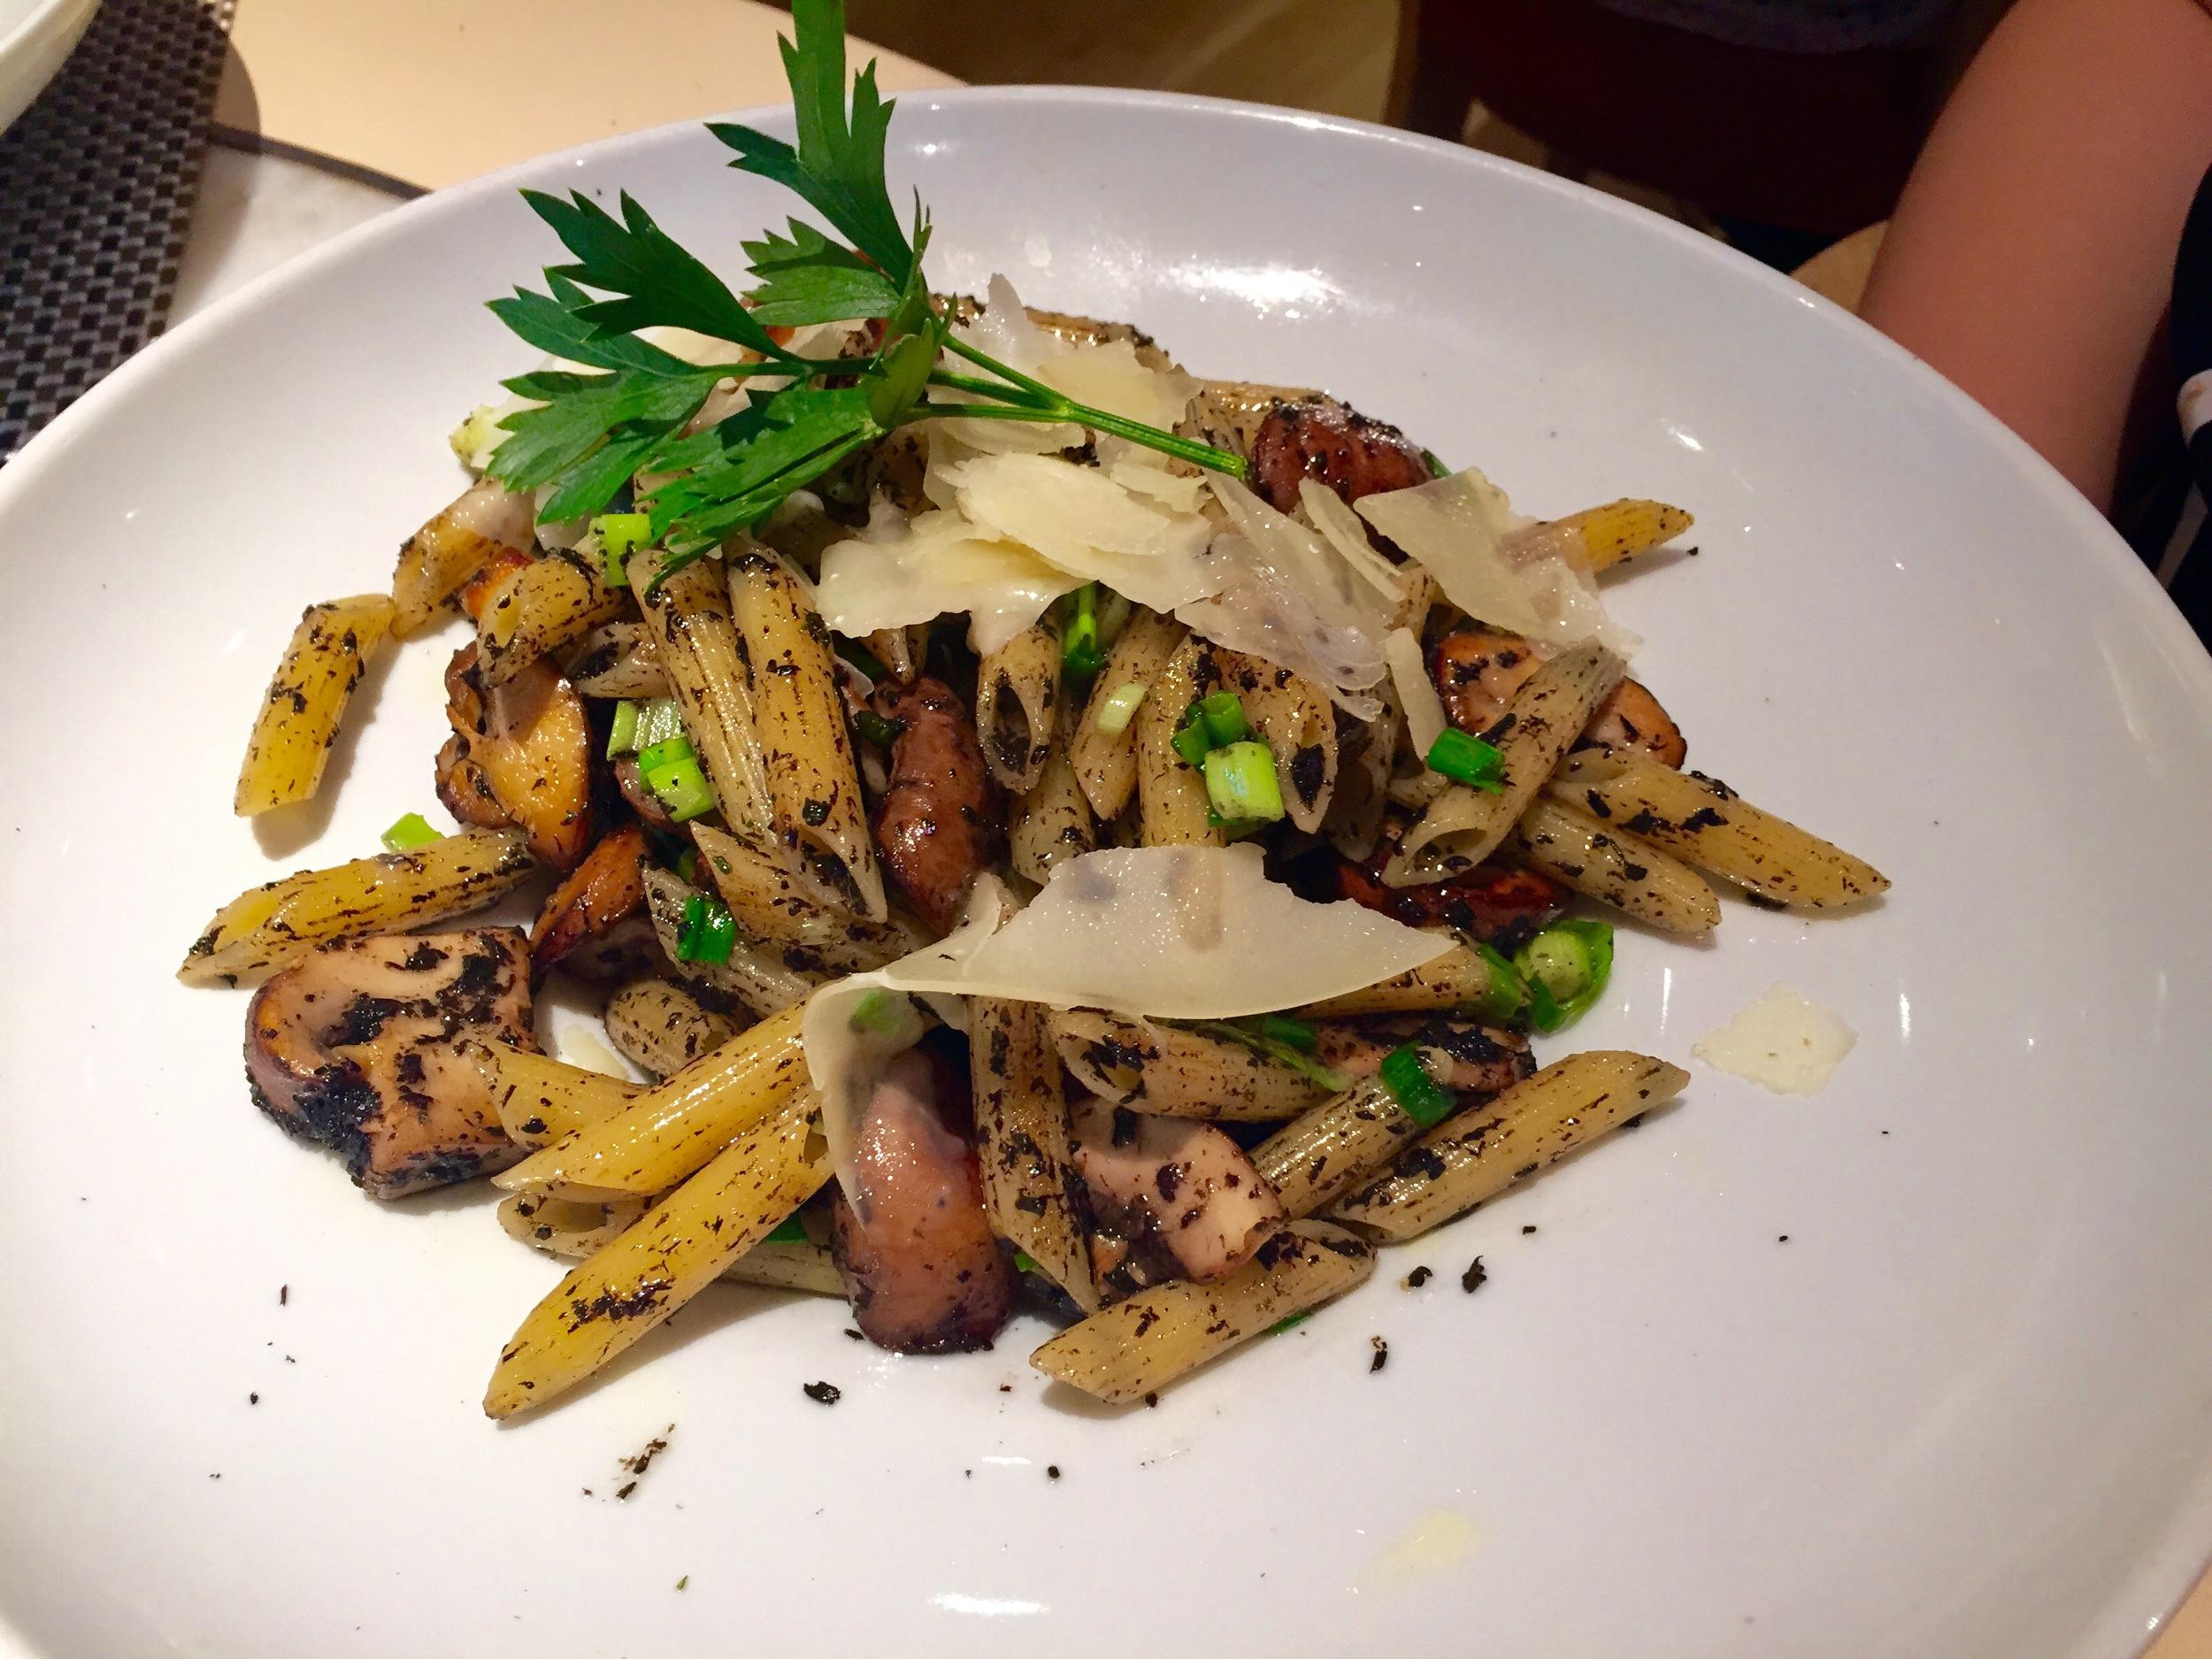 Penne Funghi Tartufo:   Cremini and black trumpet mushroom, Parmesan parsley, scallion – White Truffle Olive Oil